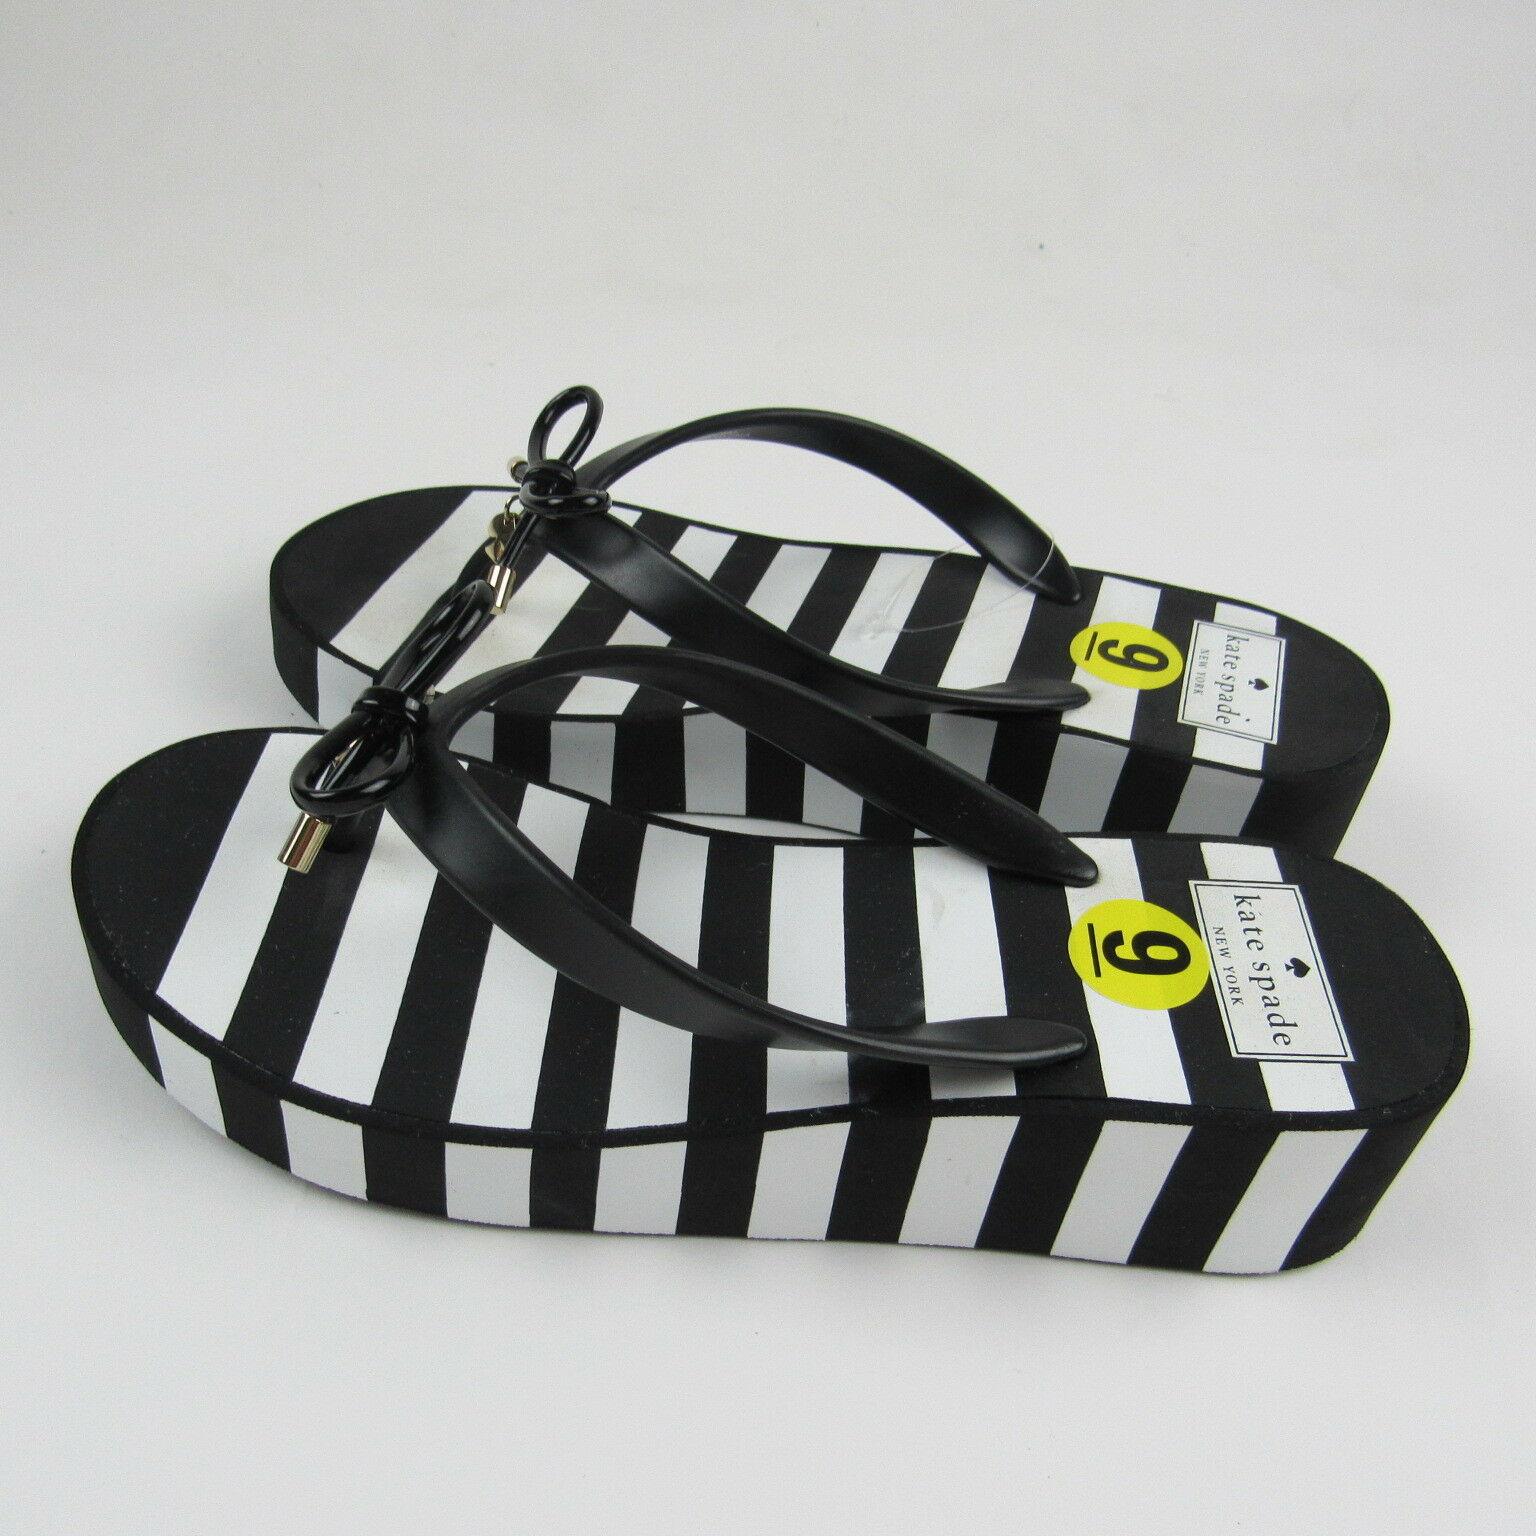 2807587c1 Kate Spade Womens Flip Flops Sandals Black White Striped Platform Thong Bow